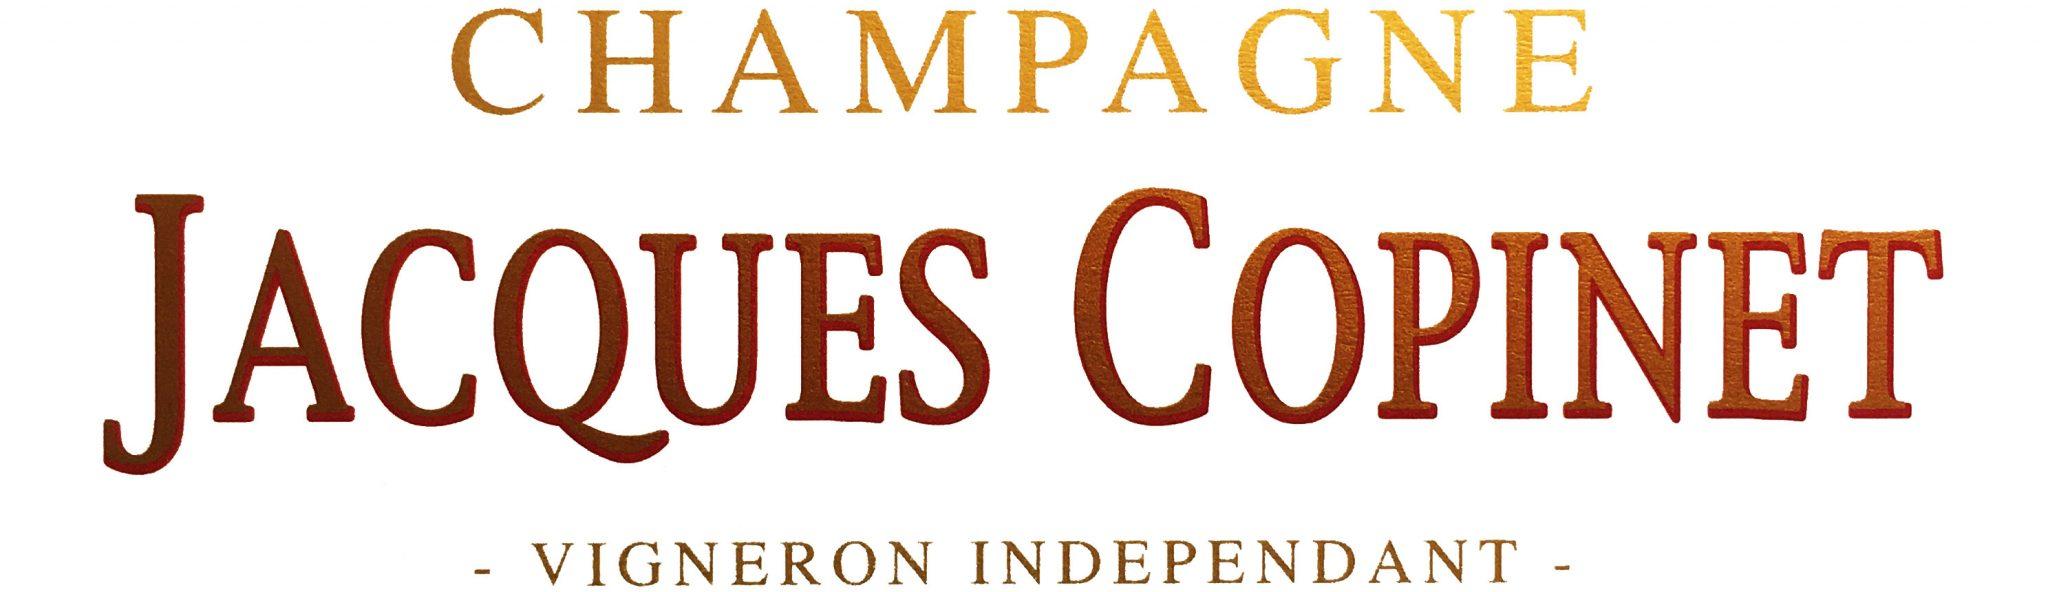 Champagne Jacques Copinet